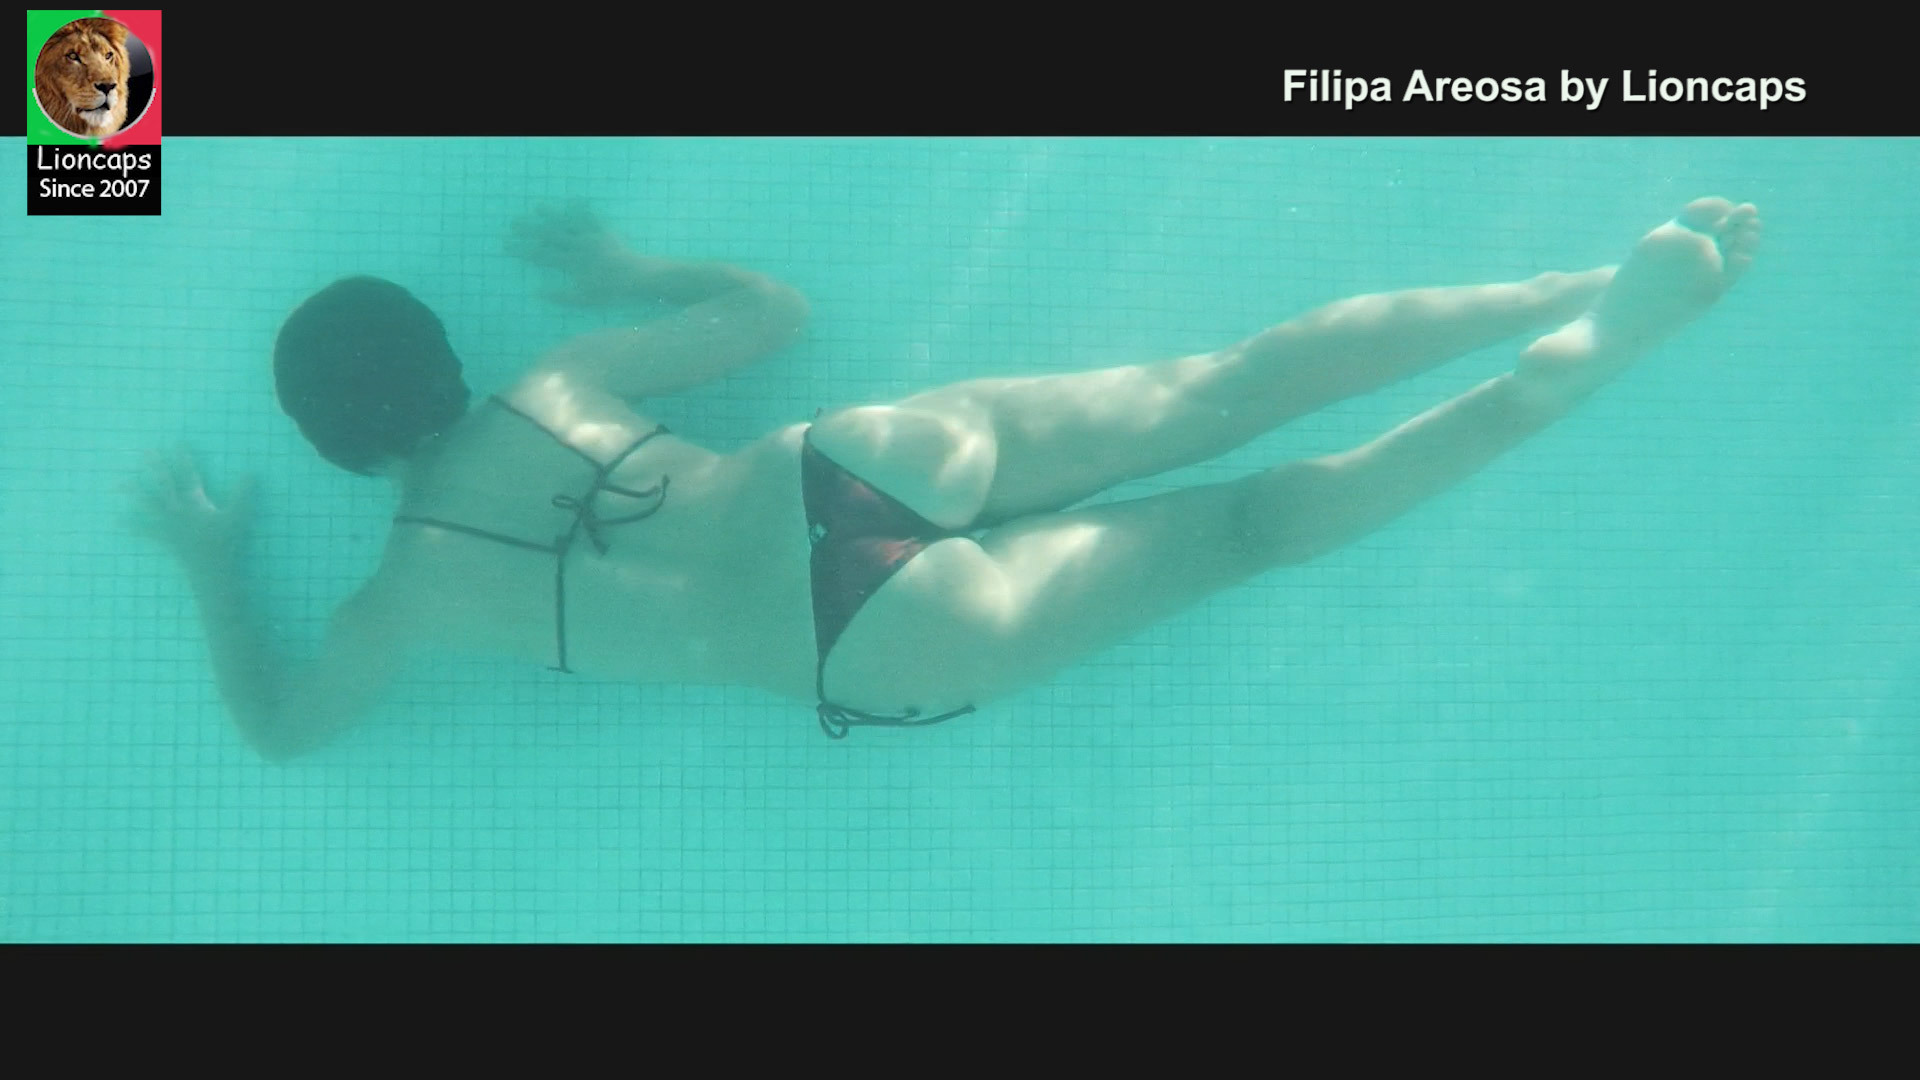 filipa_areosa (12).jpg